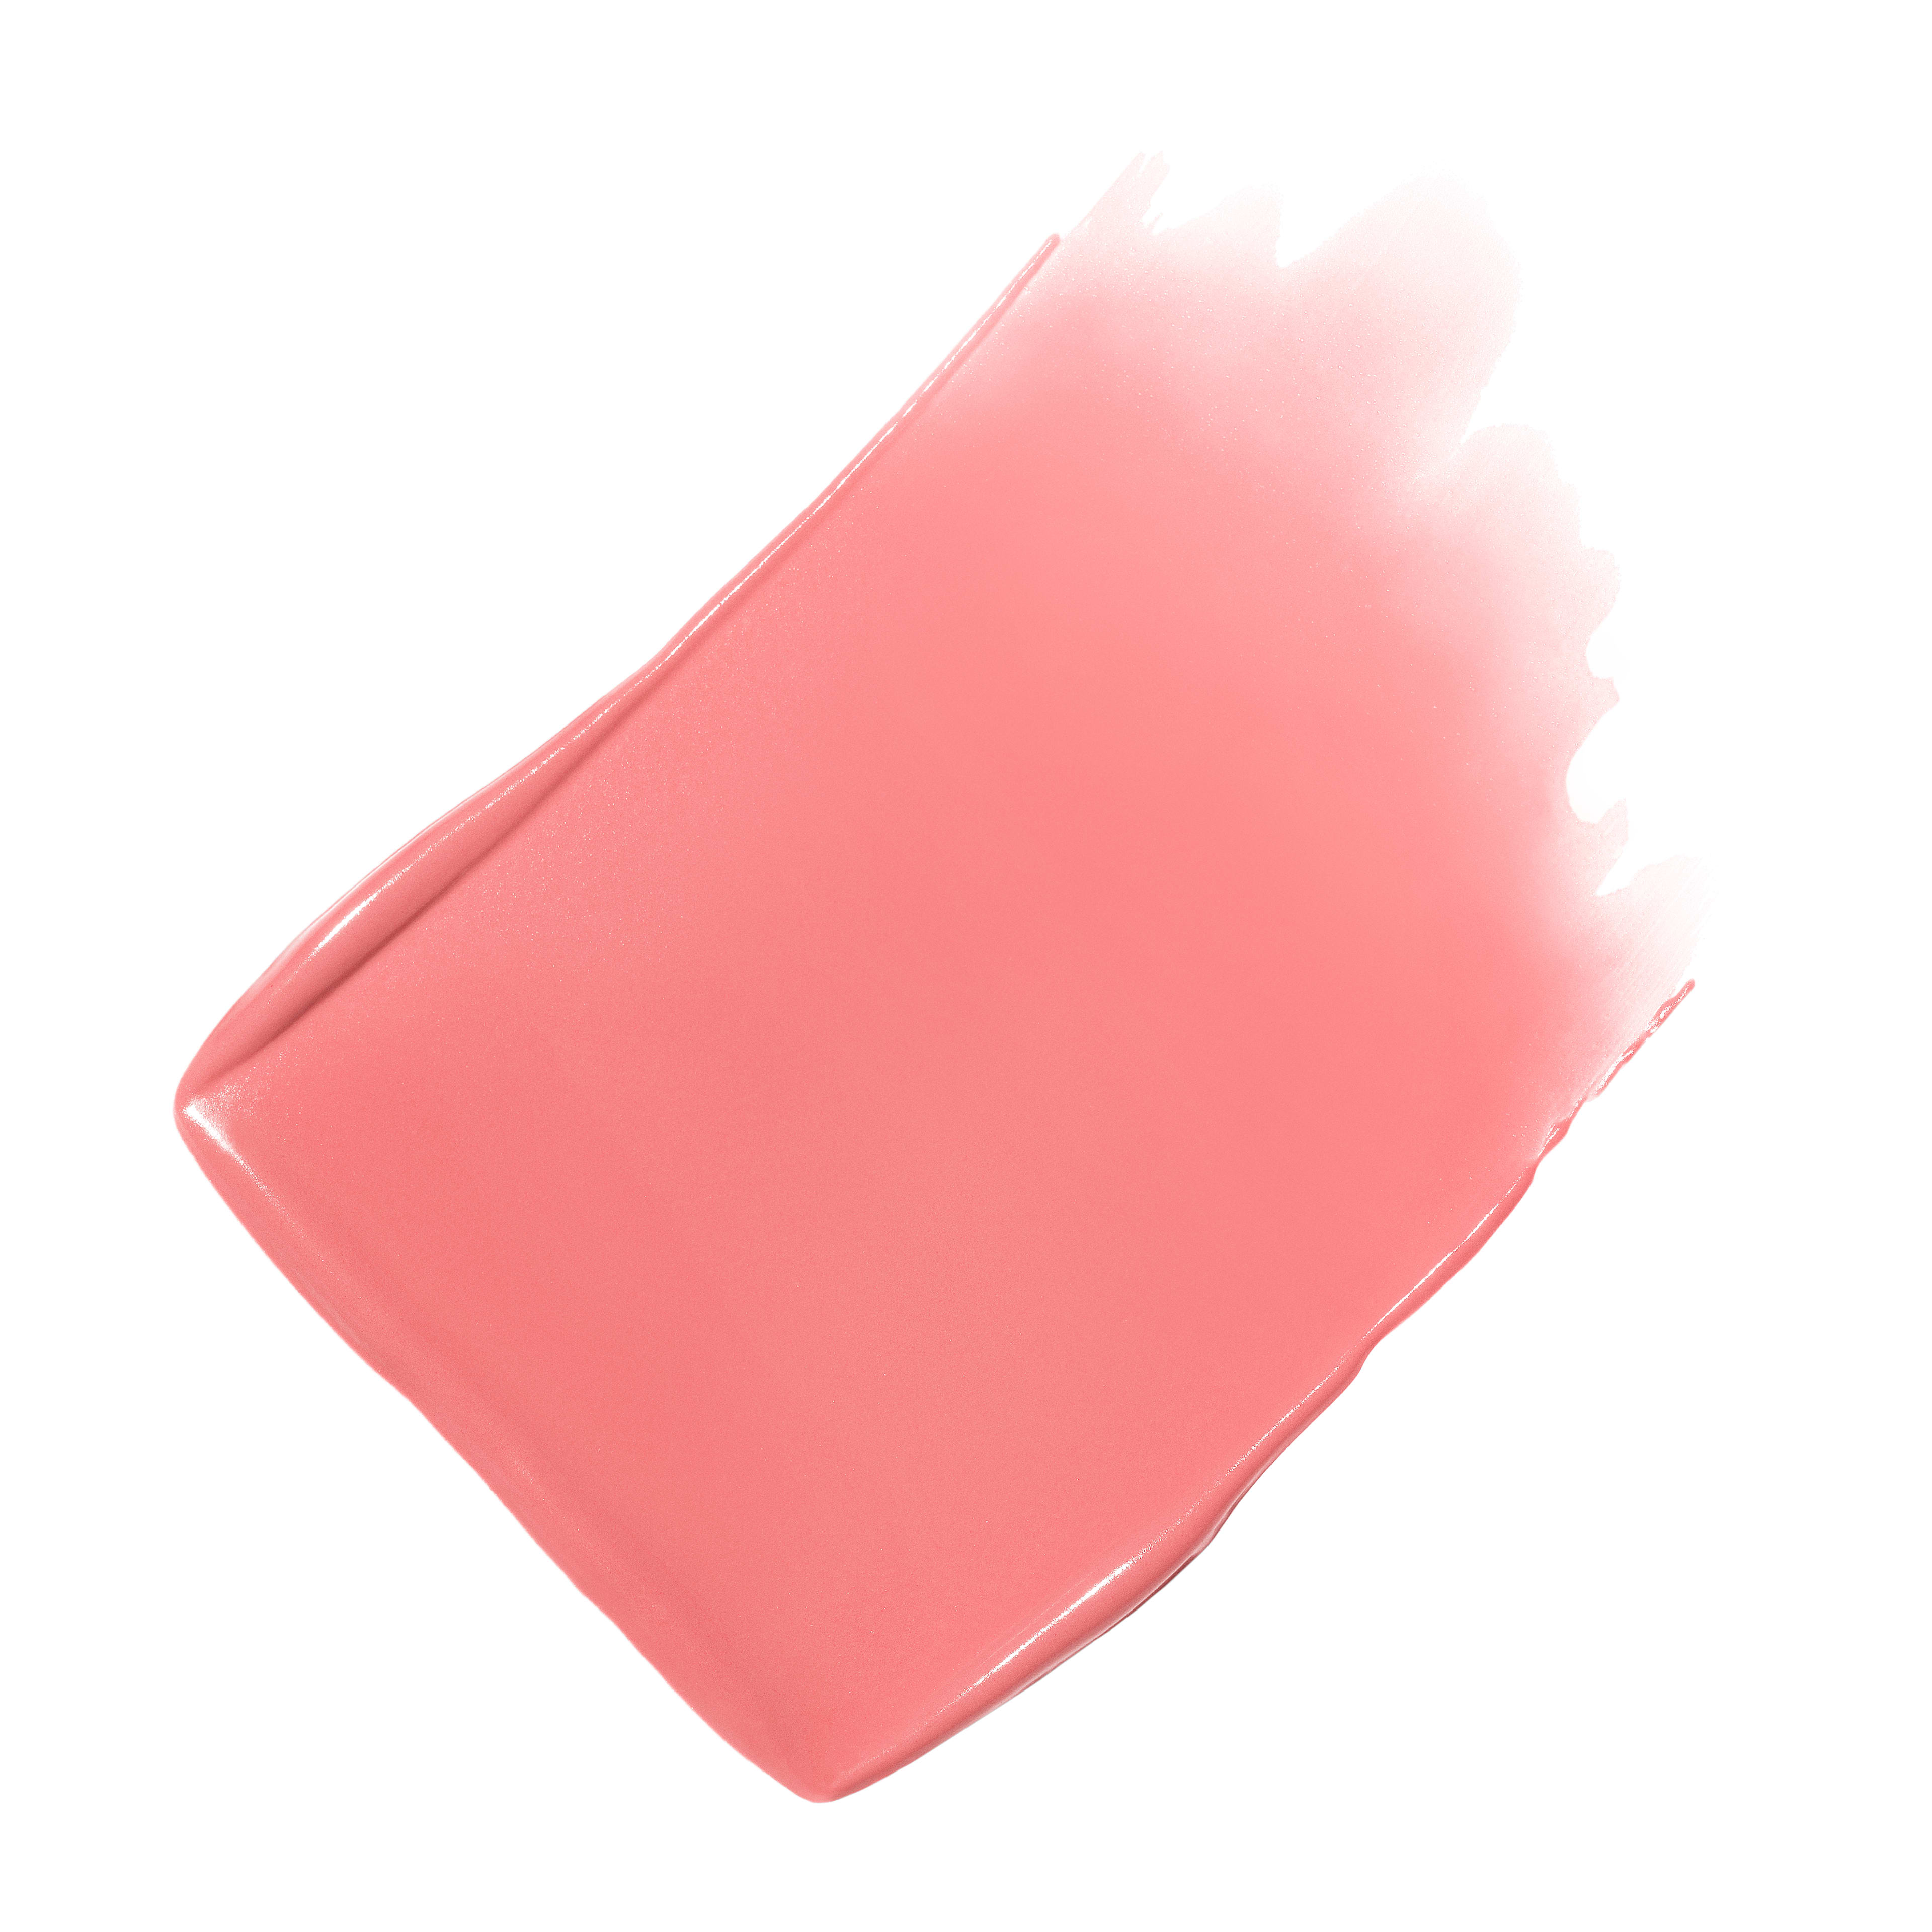 ROUGE COCO LIP BLUSH - makeup - 0.19OZ. - Basic texture view